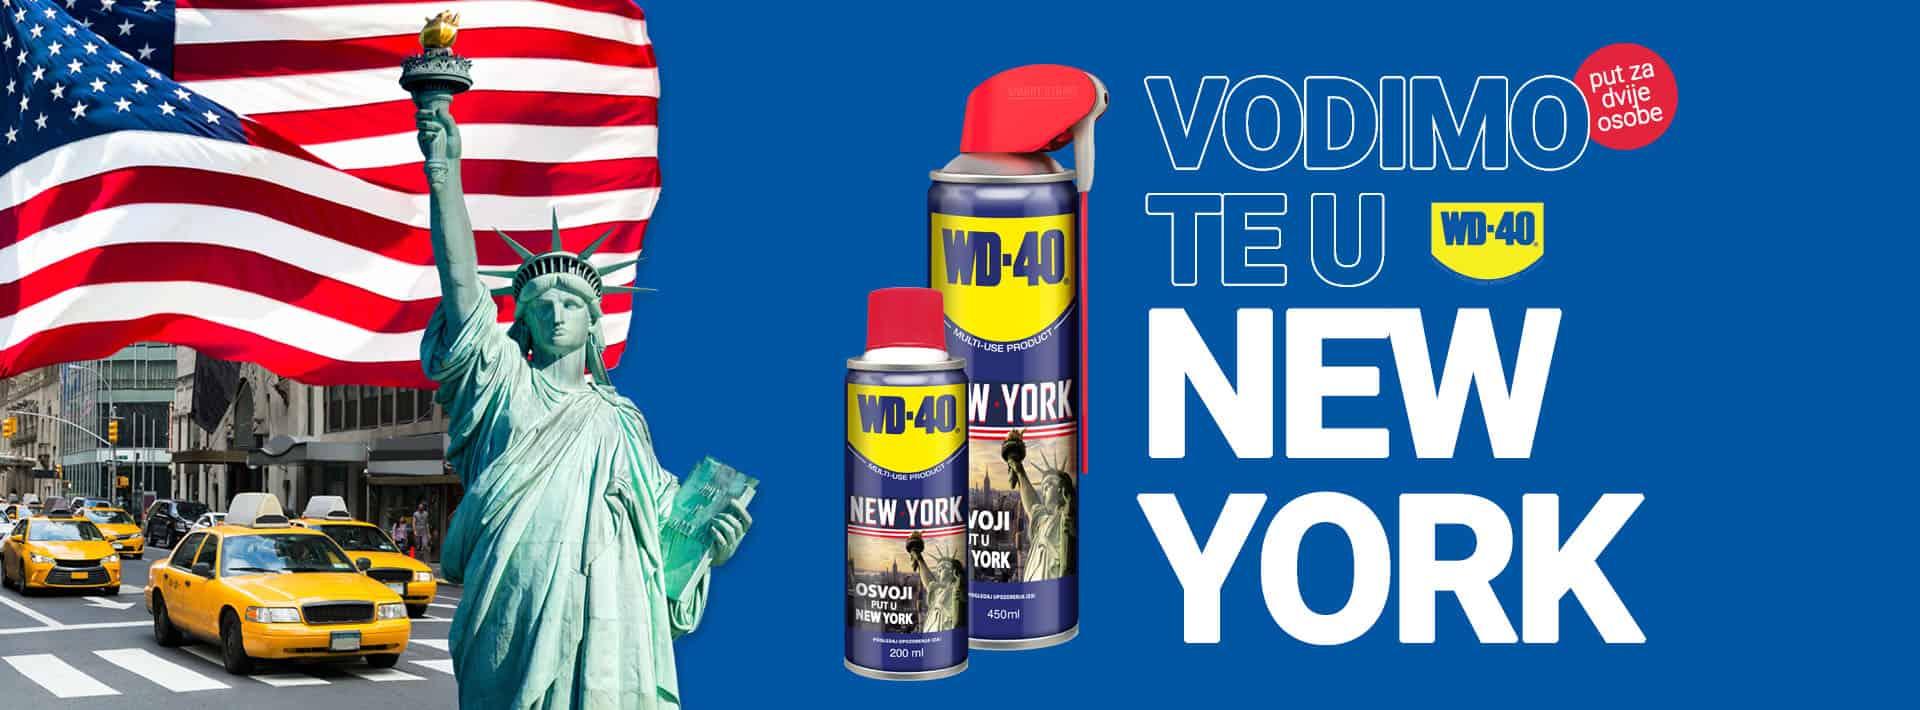 wd40 new york banner 1